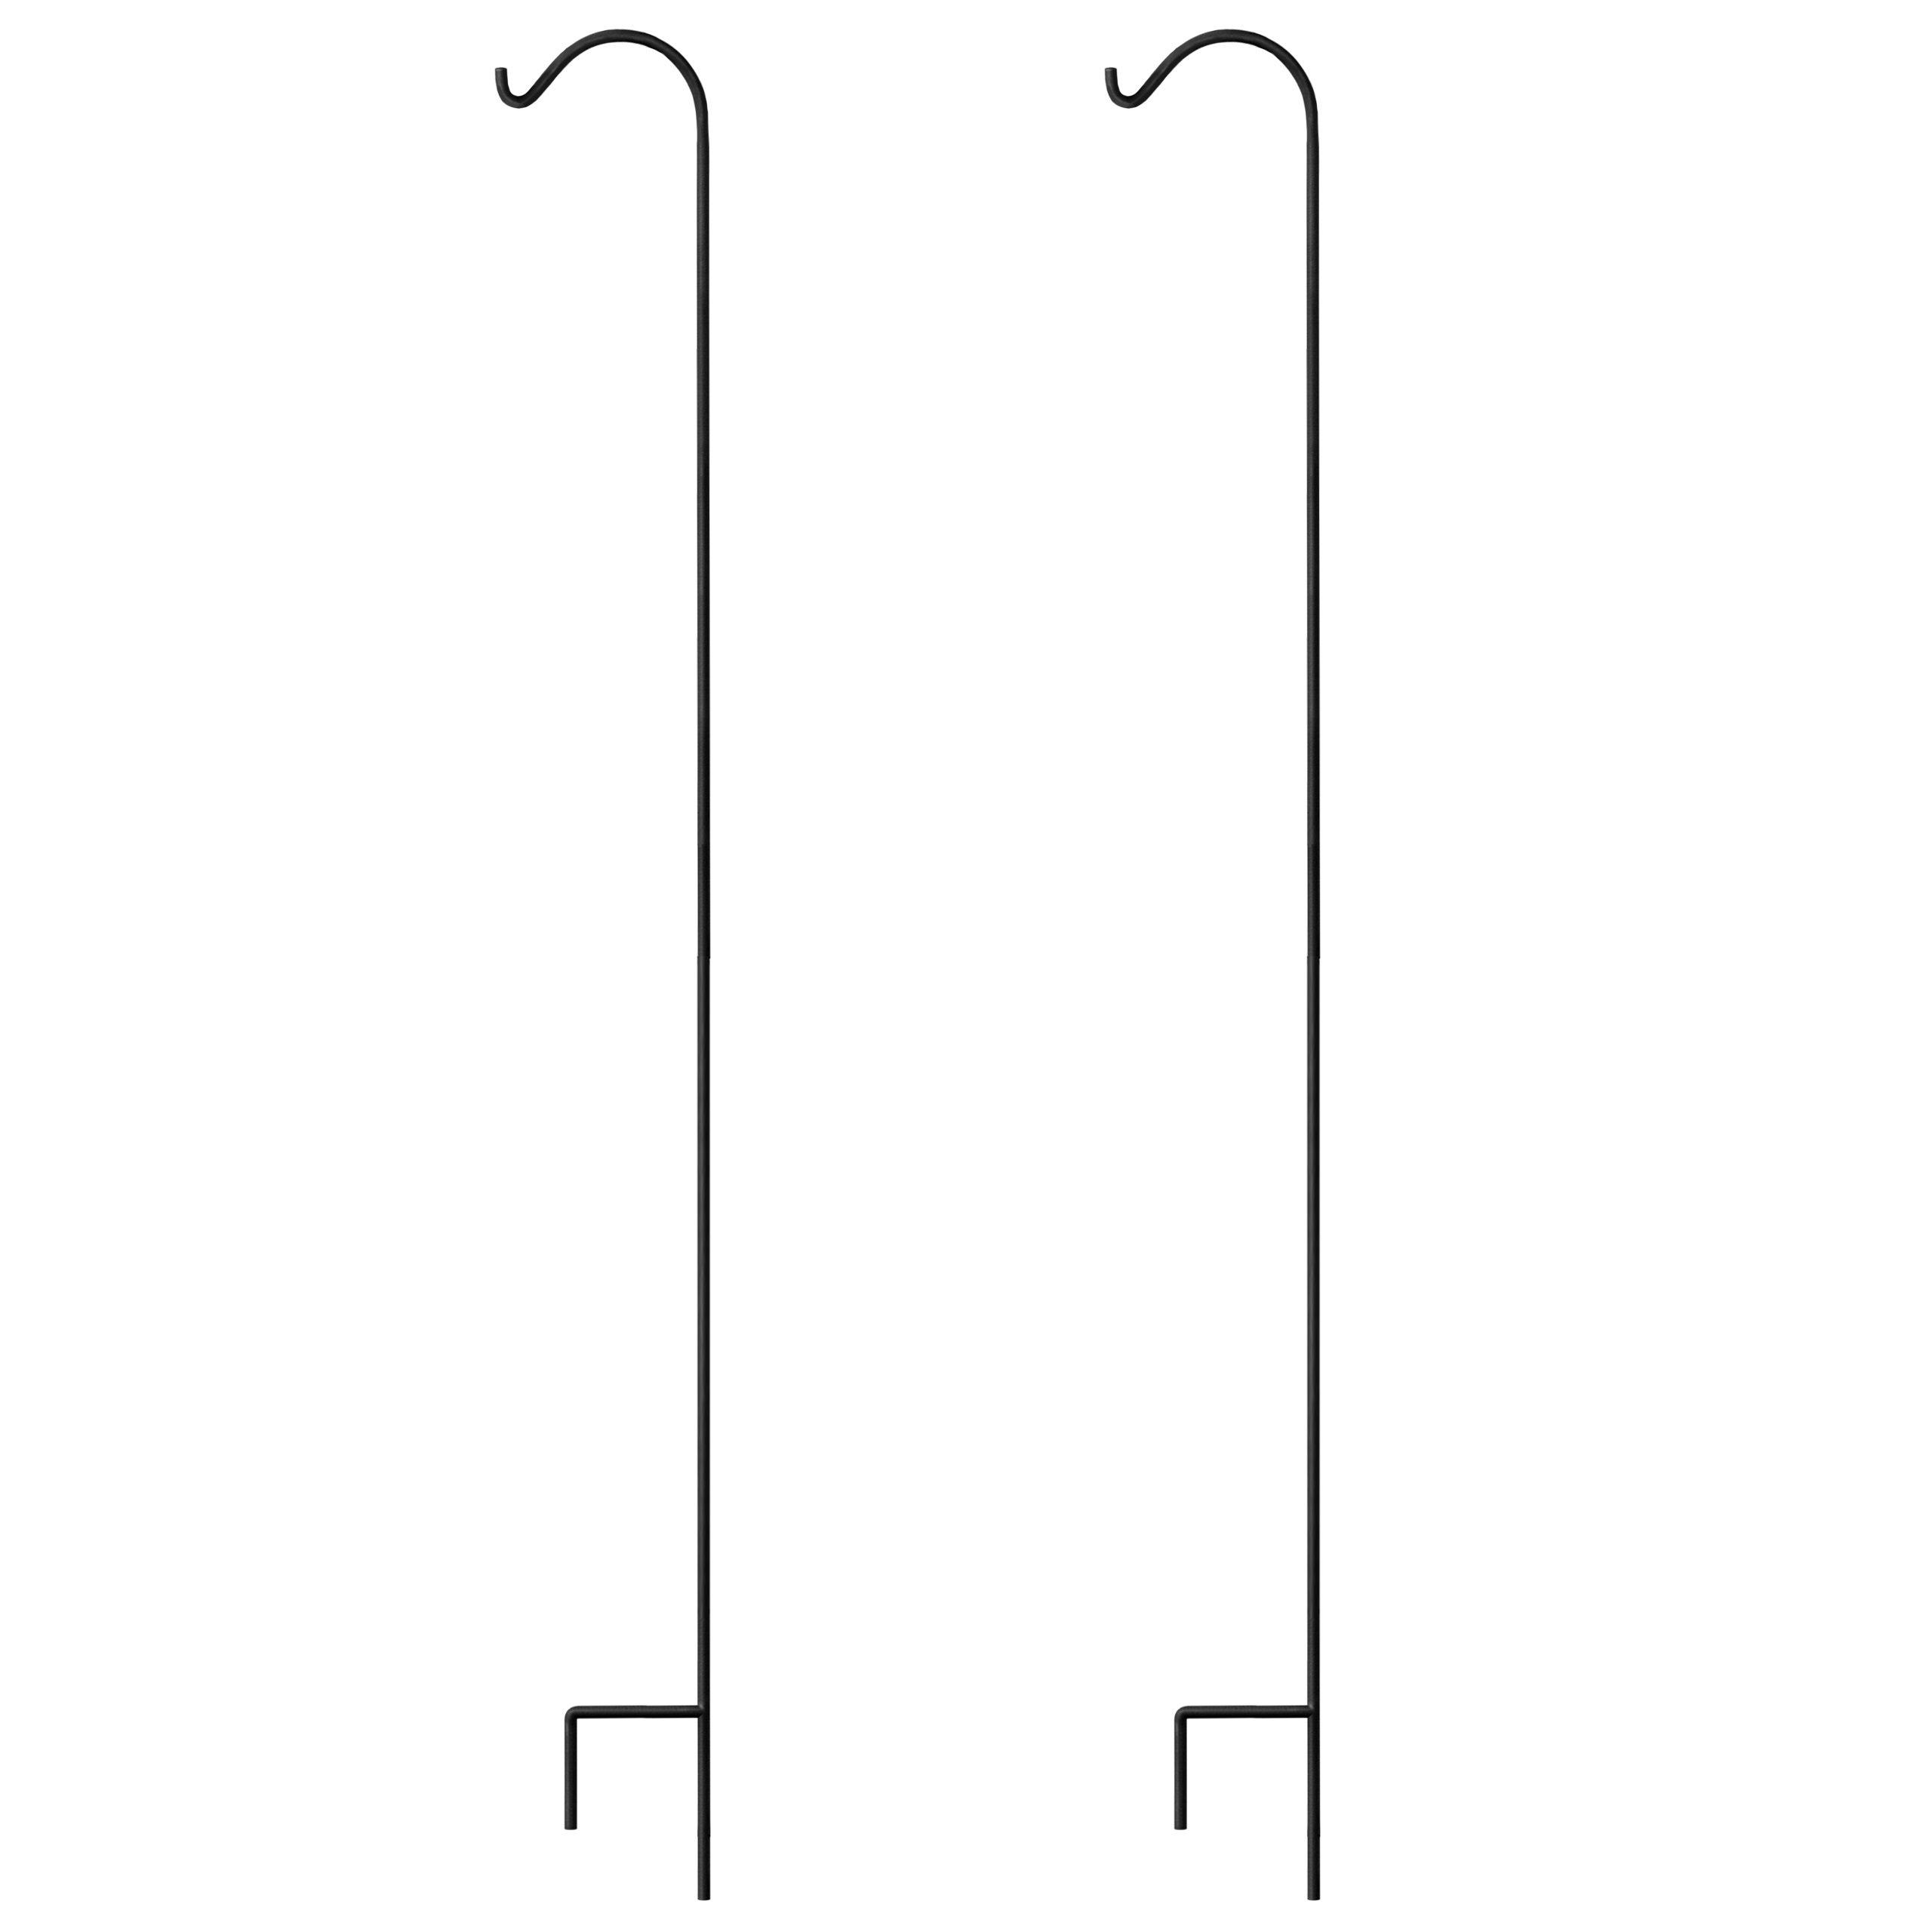 GrayBunny Shepherd Hook, 92 inch Black 3/5 Inch Thick, Set of 2, Solid Single Piece Heavy Duty Rust Resistant Premium Metal Hook Hangers For Weddings, Plant Baskets Solar Lights Lantern Bird Feeders